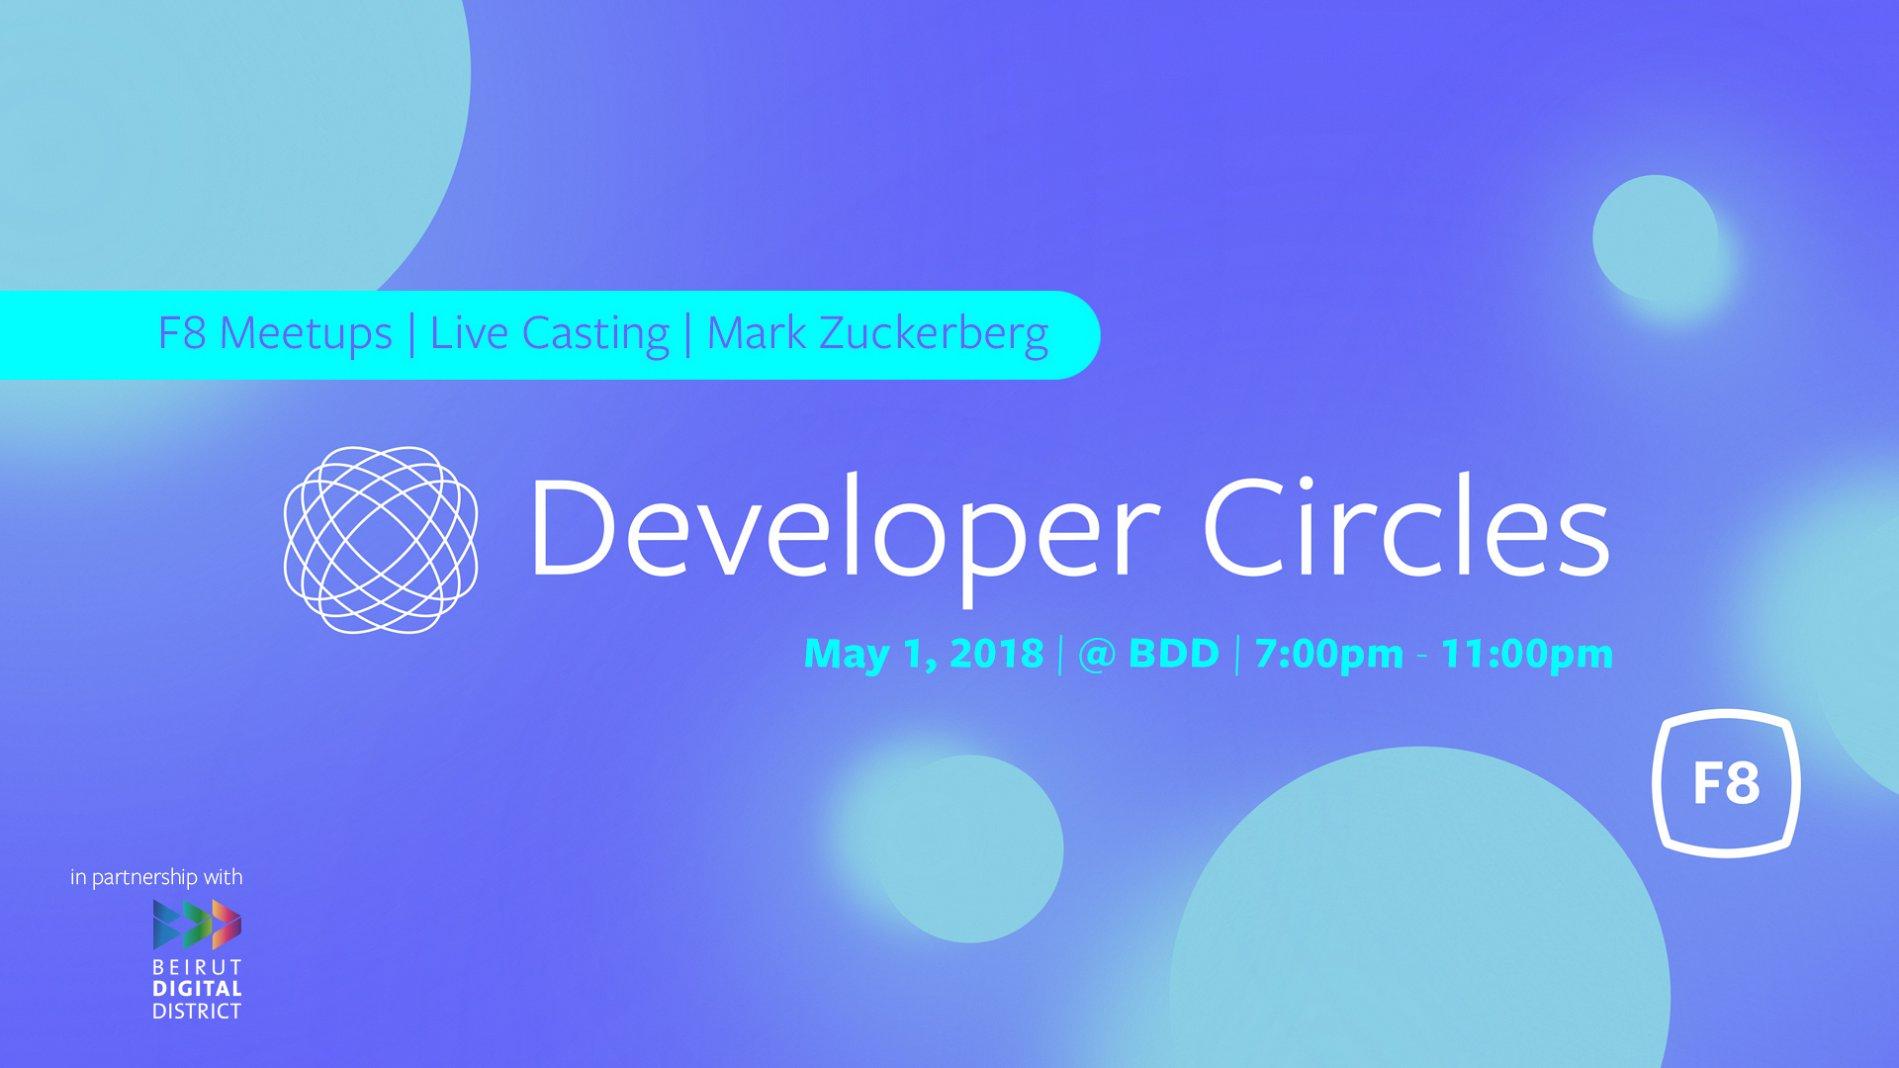 facebook f8 2018 yearly event developer circle beirut lebtivity